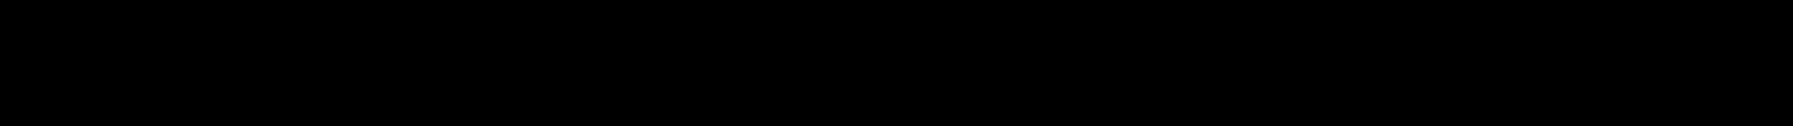 {\displaystyle r={\frac {2A}{P}}={\sqrt {\frac {(s-a)(s-b)(s-c)}{s}}}.={\sqrt {\frac {(P-2a)(P-2b)(P-2c)}{4P}}}={\frac {\sqrt {{\frac {(a^{2}+b^{2}+c^{2})^{2}}{4}}-{\frac {a^{4}+b^{4}+c^{4}}{2}}}}{a+b+c}}=s{\frac {sin({\frac {360}{n}})}{2(1+cos({\frac {180}{n}})+sin({\frac {180}{n}}))}}=s{\frac {n}{(6n-12)tan({\frac {180}{n}})}}}